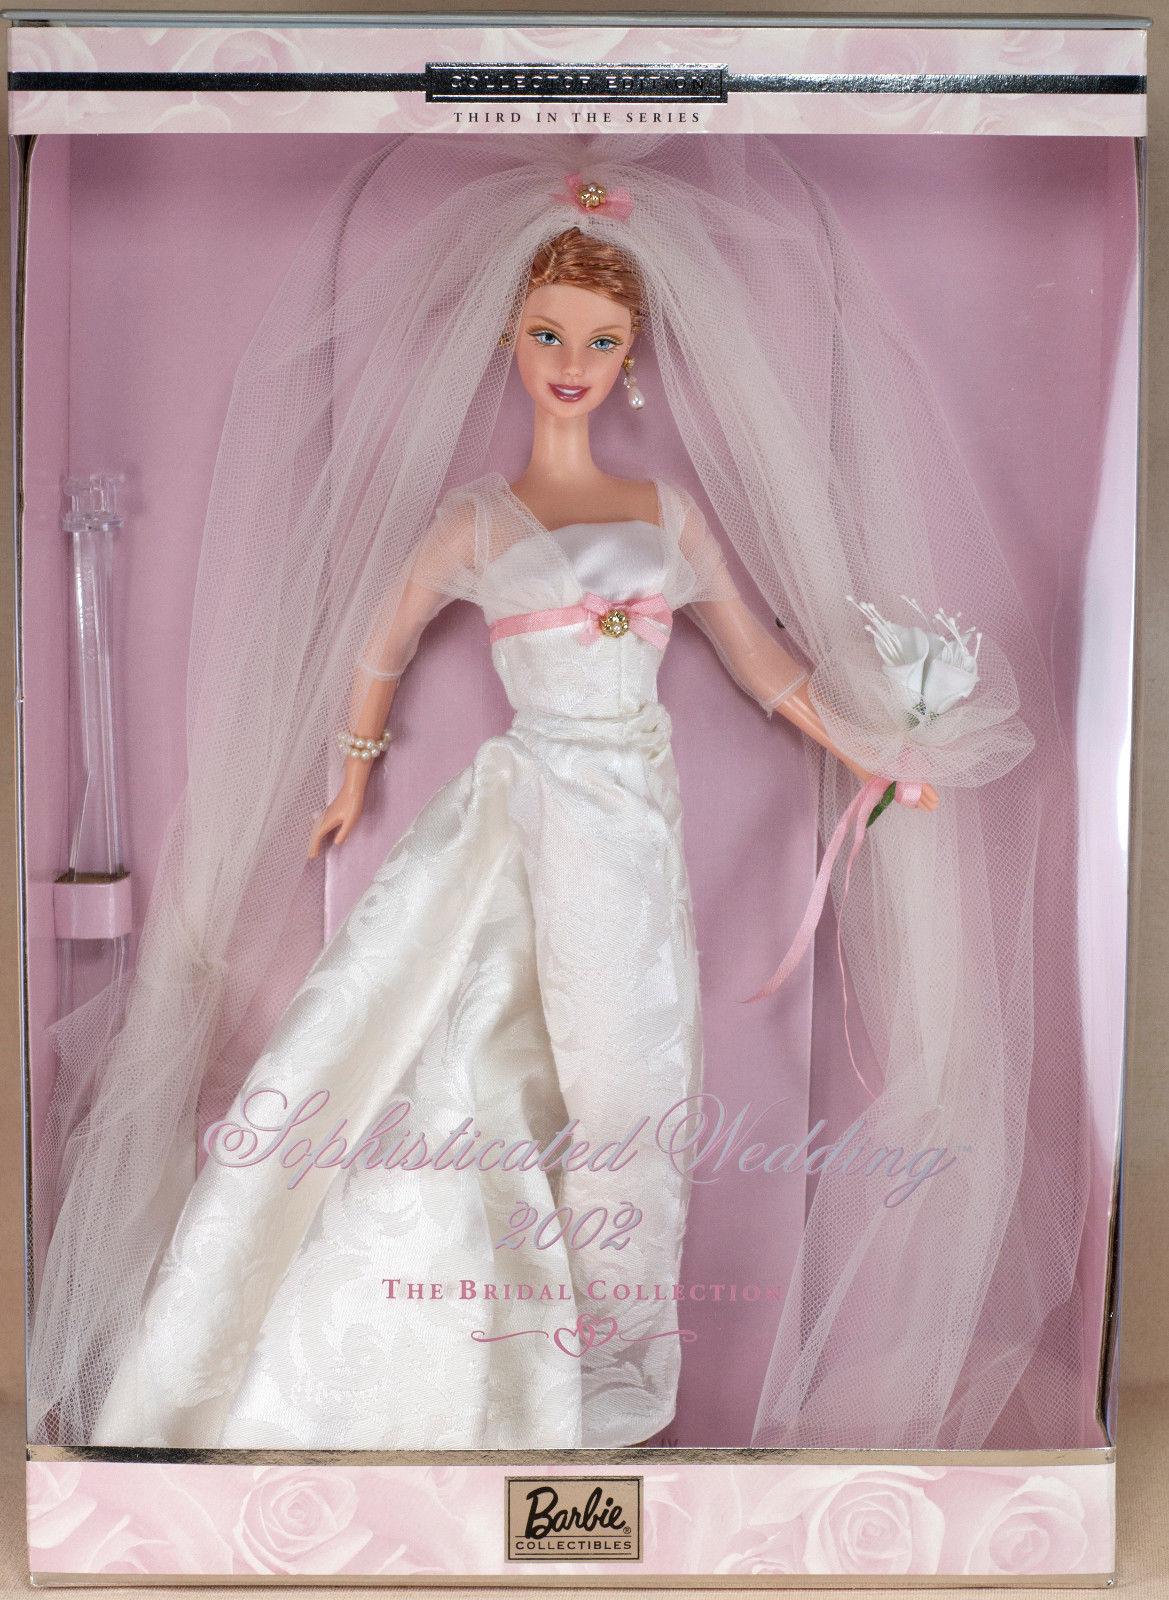 2002 Sophisticated Wedding Barbie 婚紗新娘 珍藏版芭比娃娃